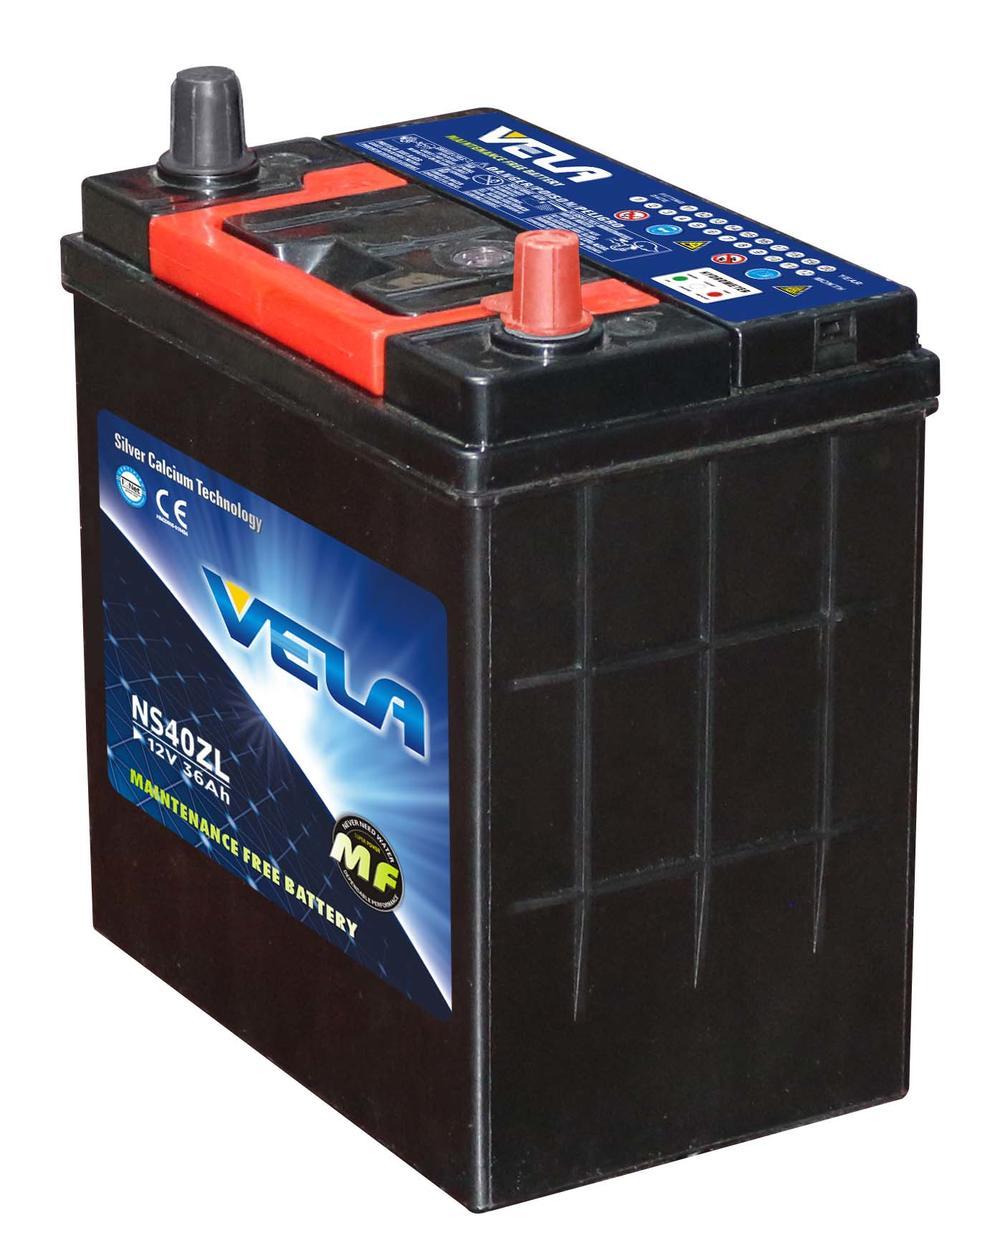 NS40ZL 12V36AH MF Car Battery With Power